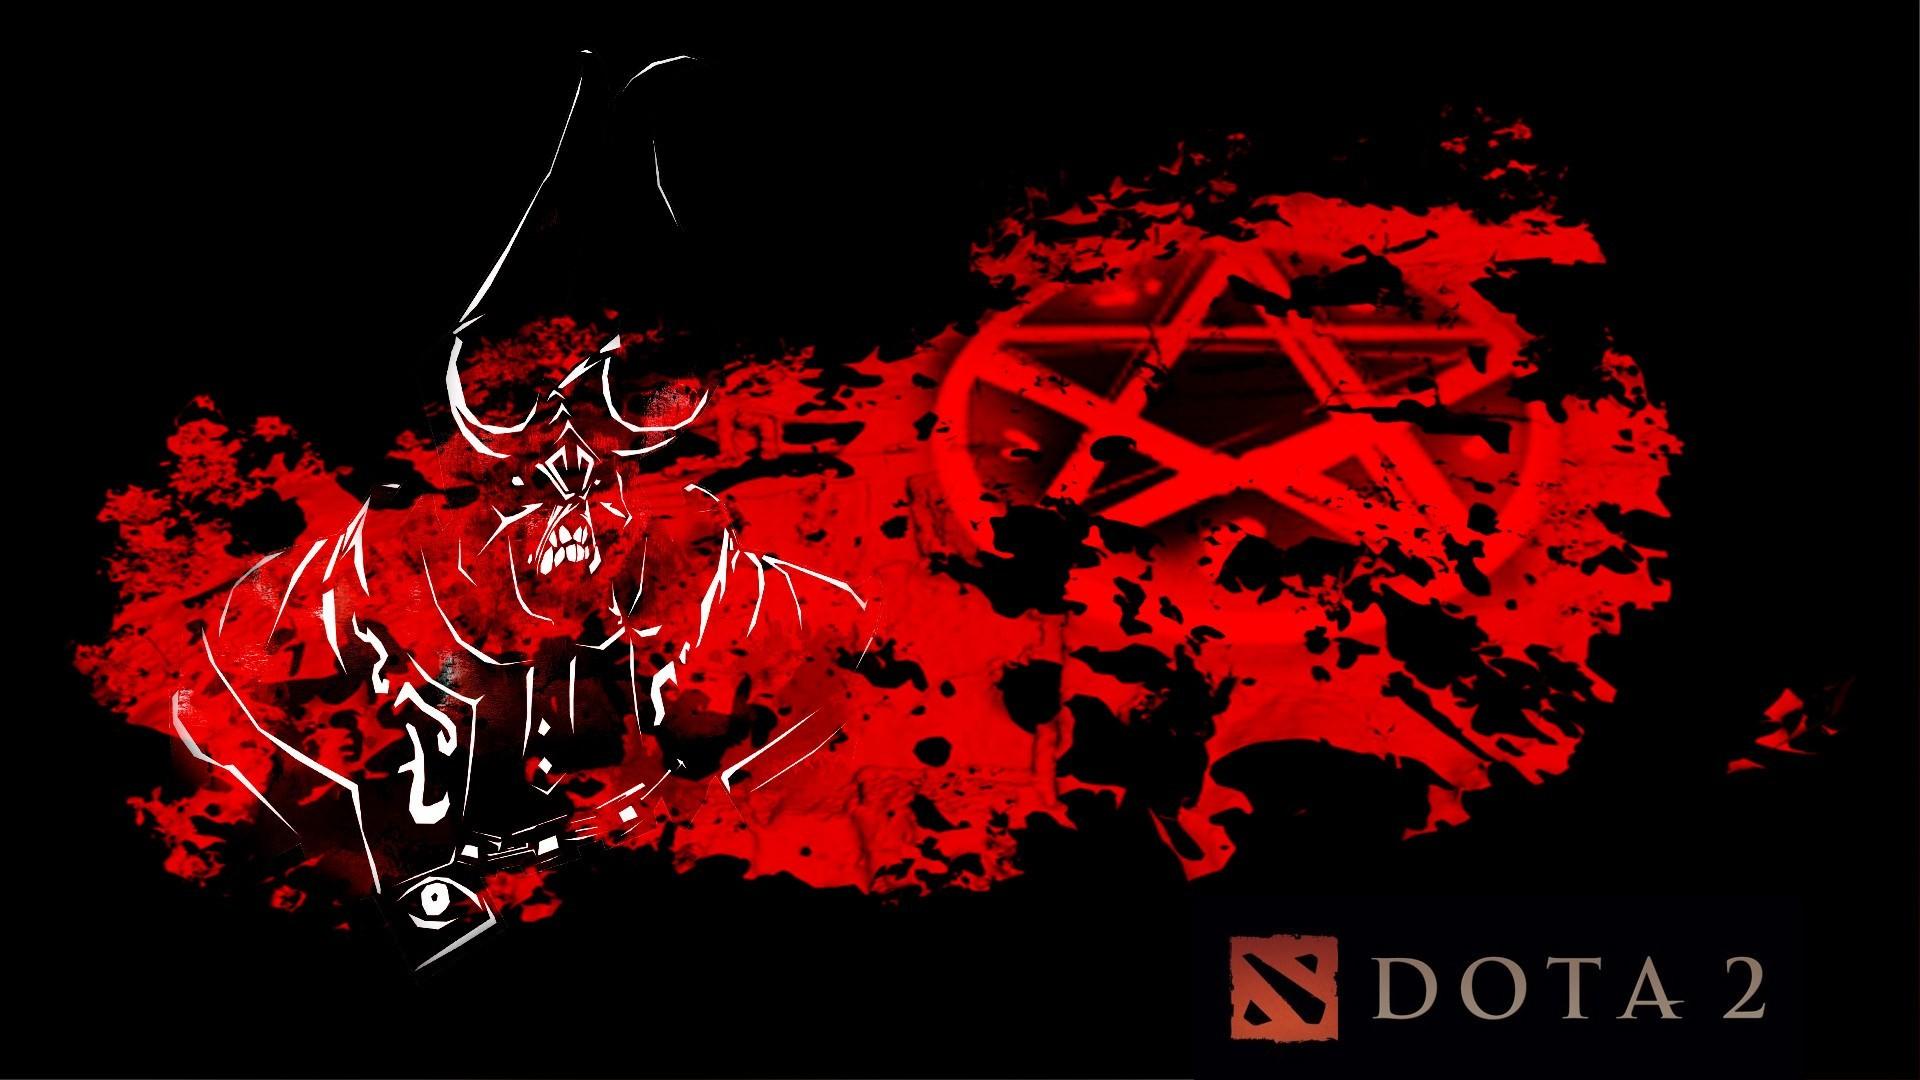 44444, widescreen wallpaper satanic pentagram